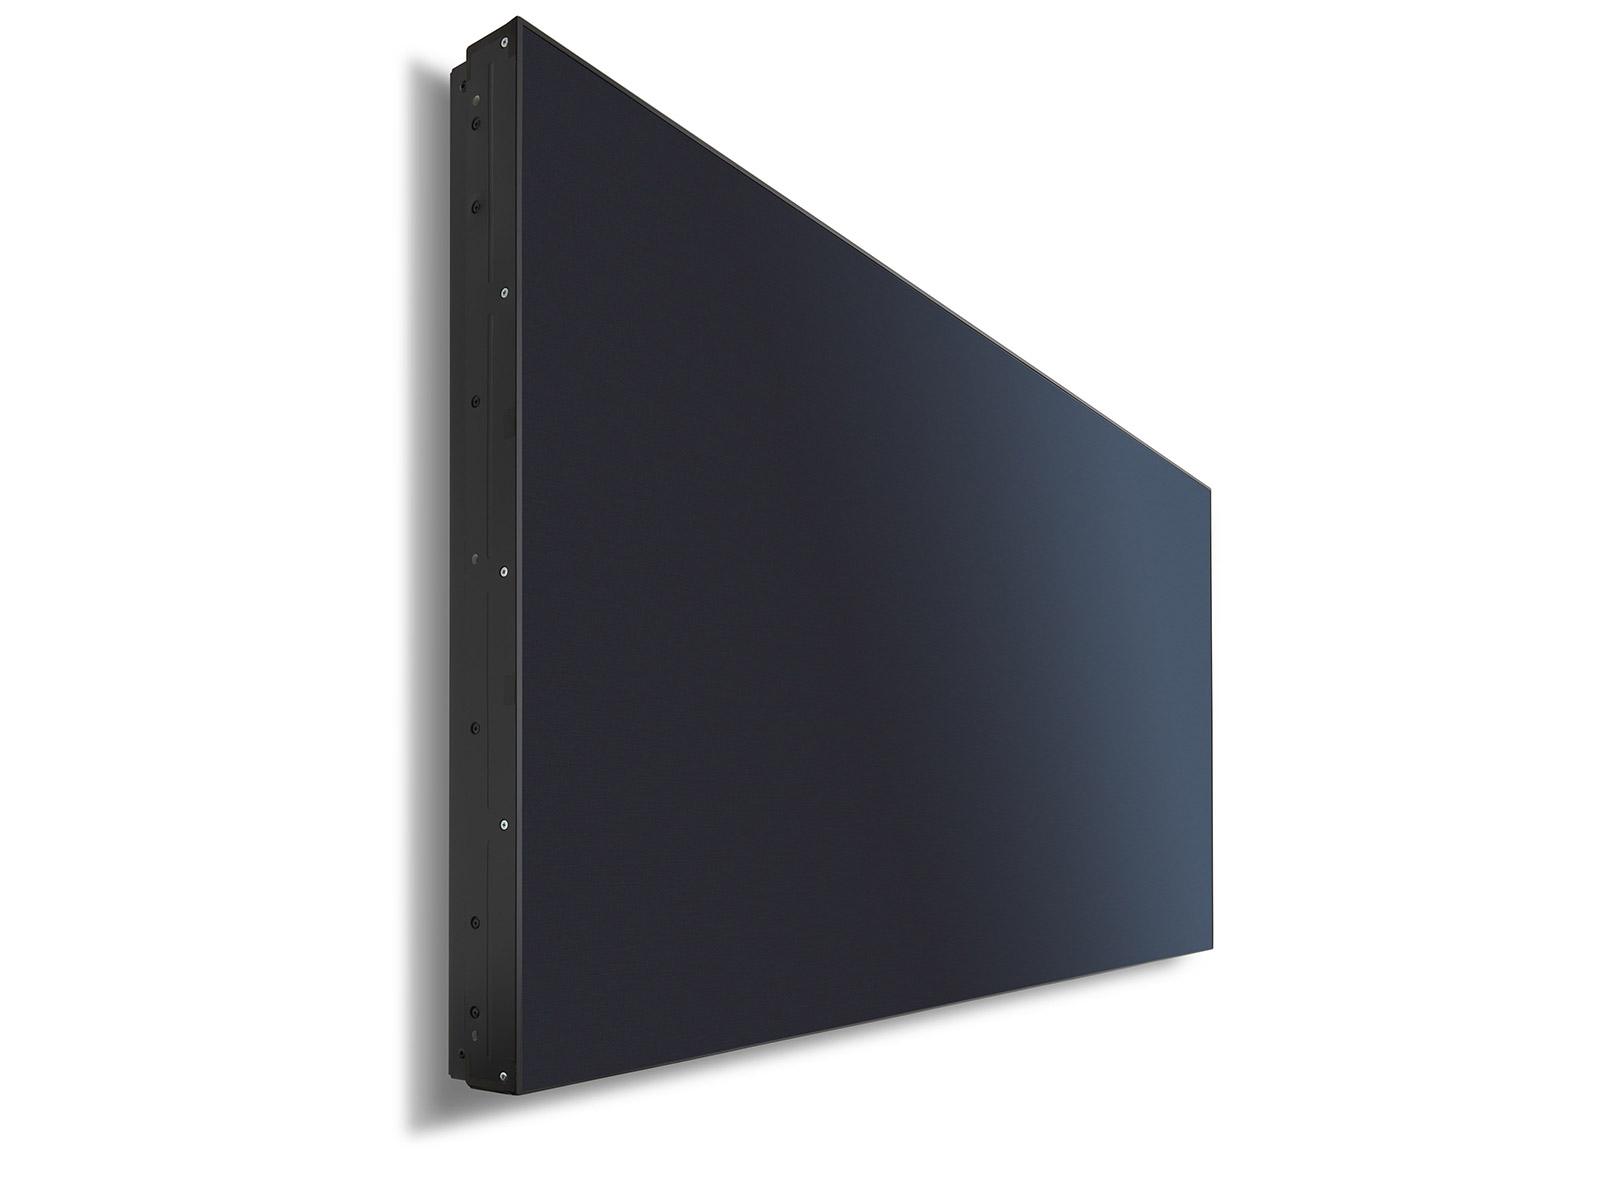 X554UNV-DisplayViewRightBlack